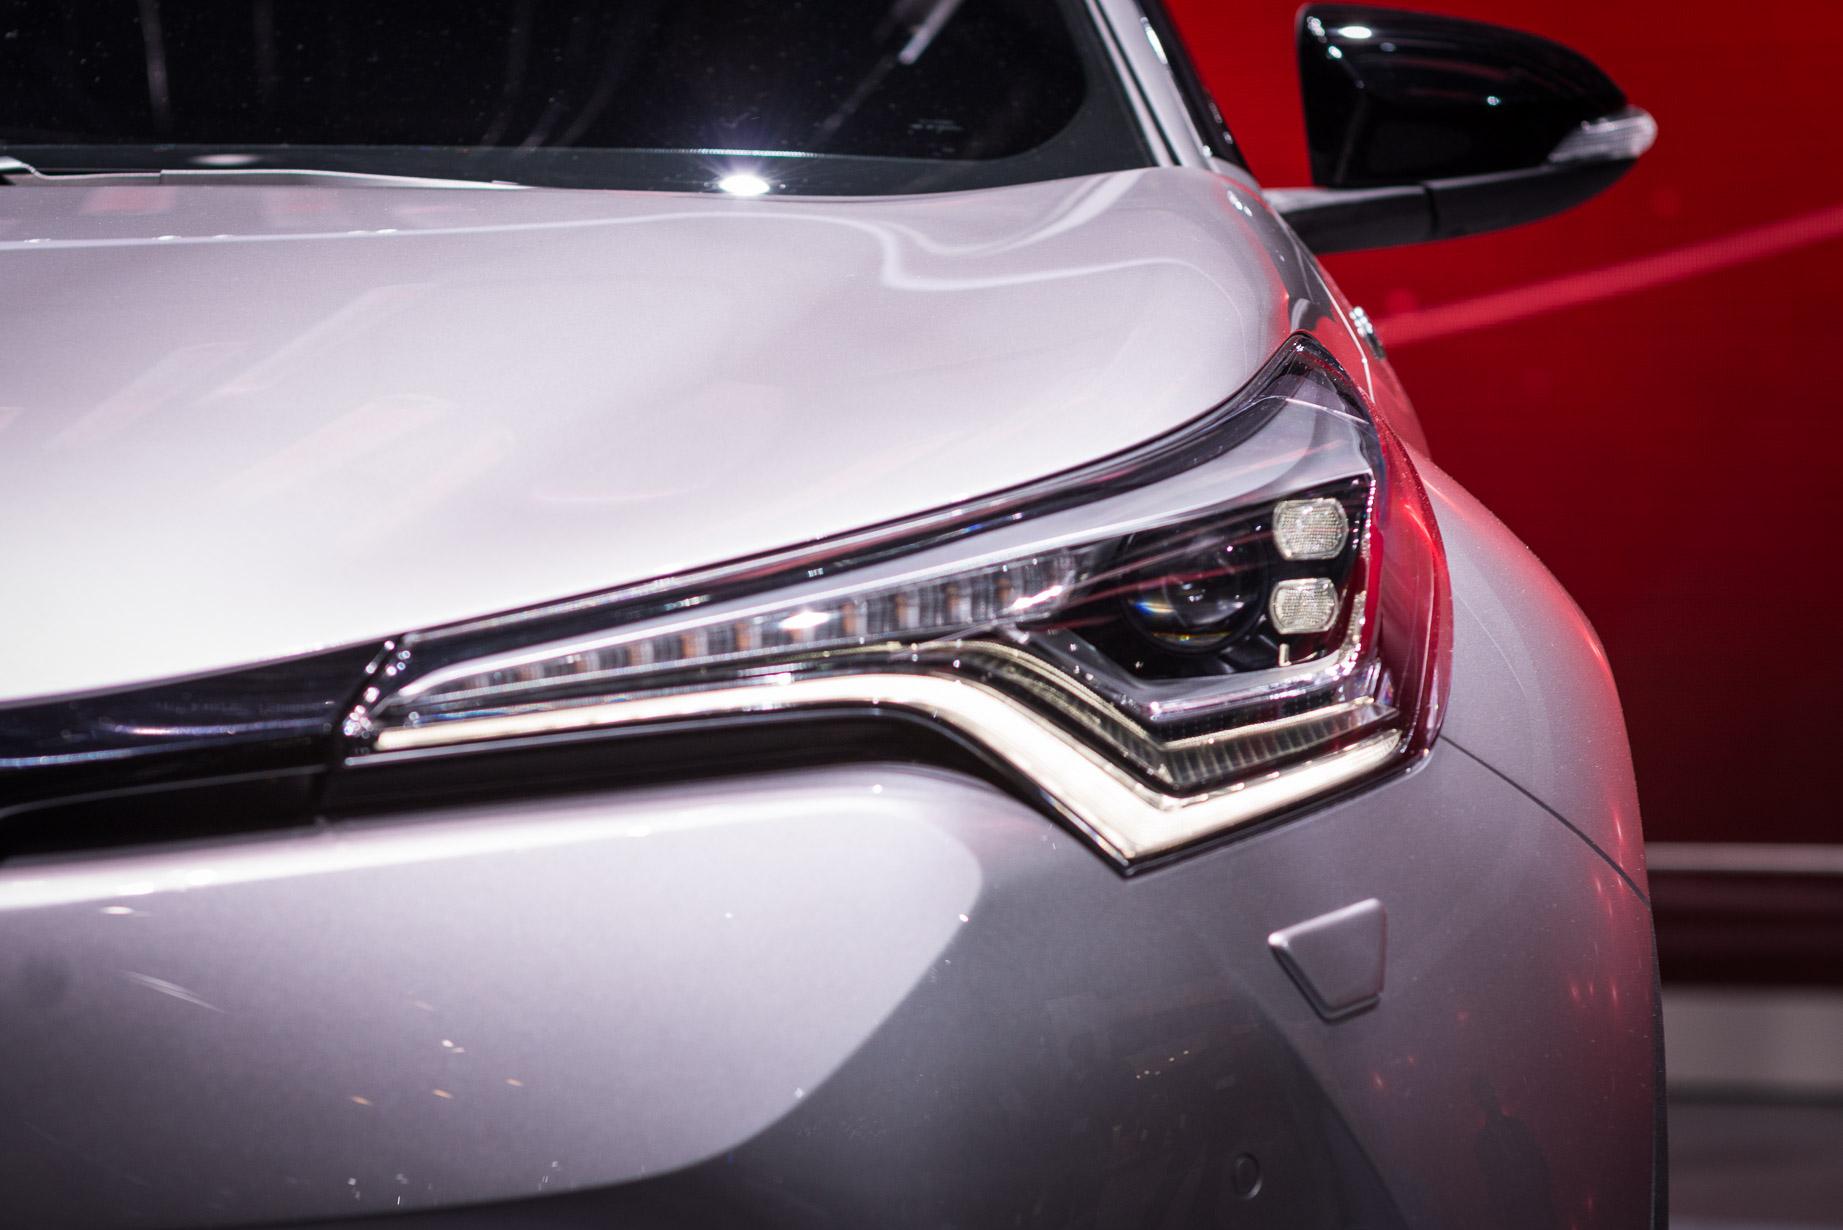 Toyota C-HR front light